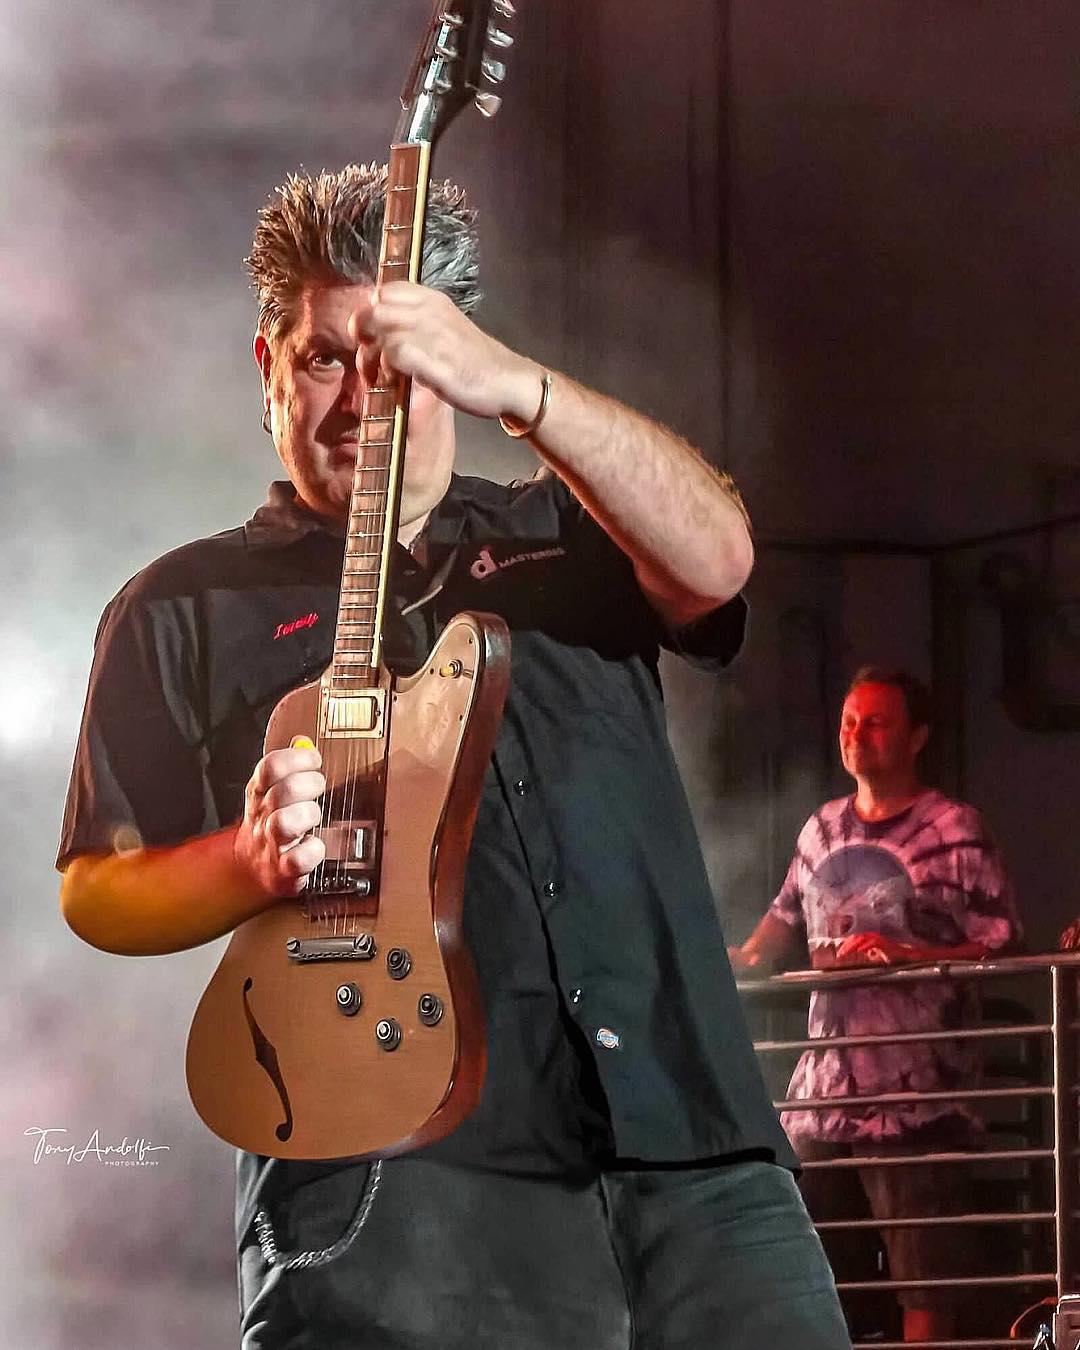 Photo credit:  Tony Andolfi